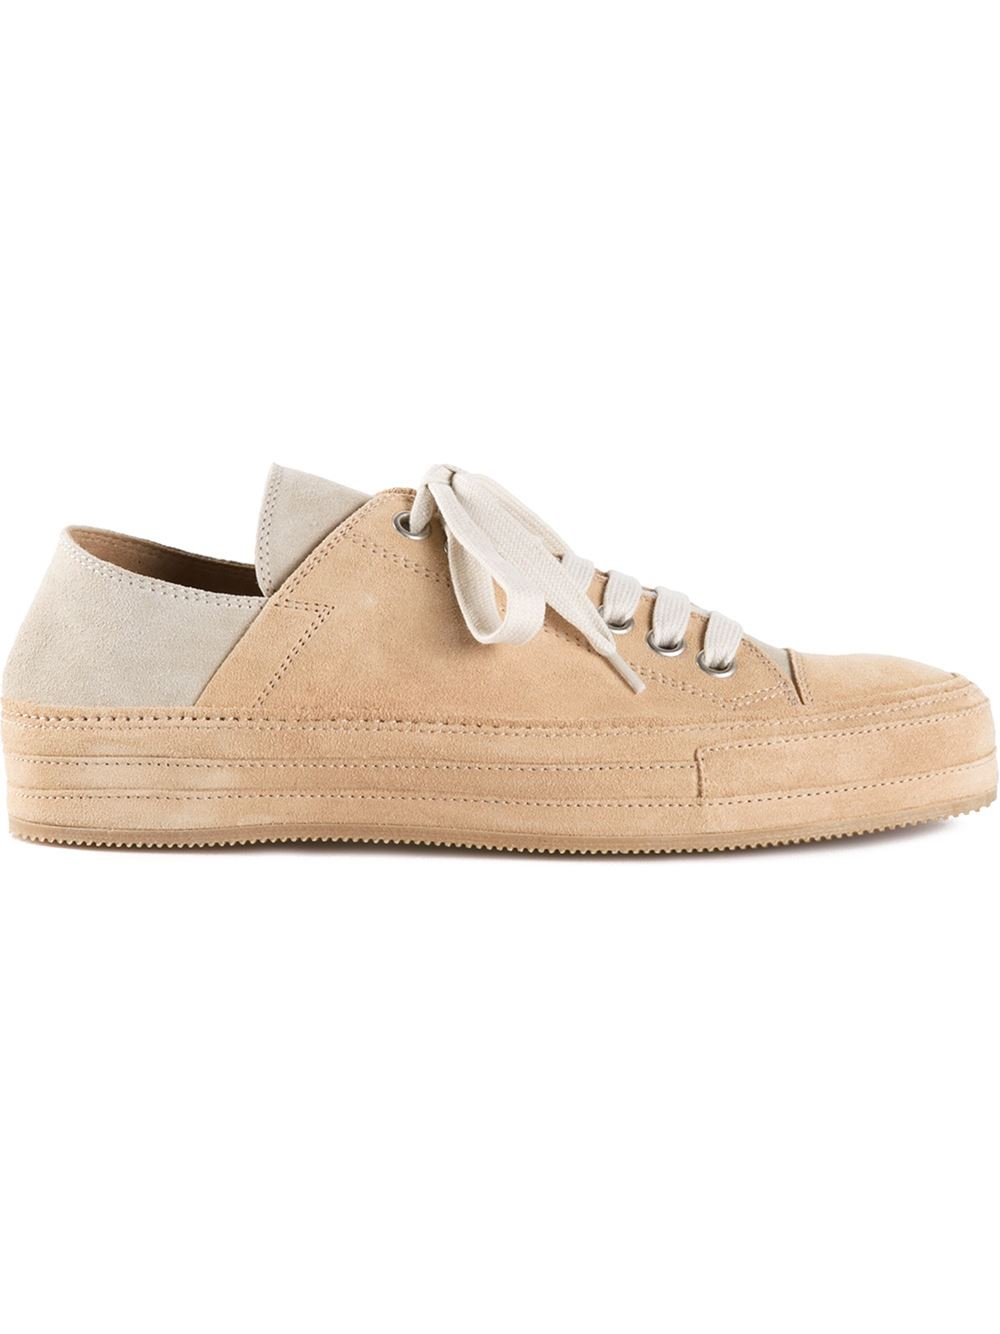 Ann Demeulemeester Shoes Sale